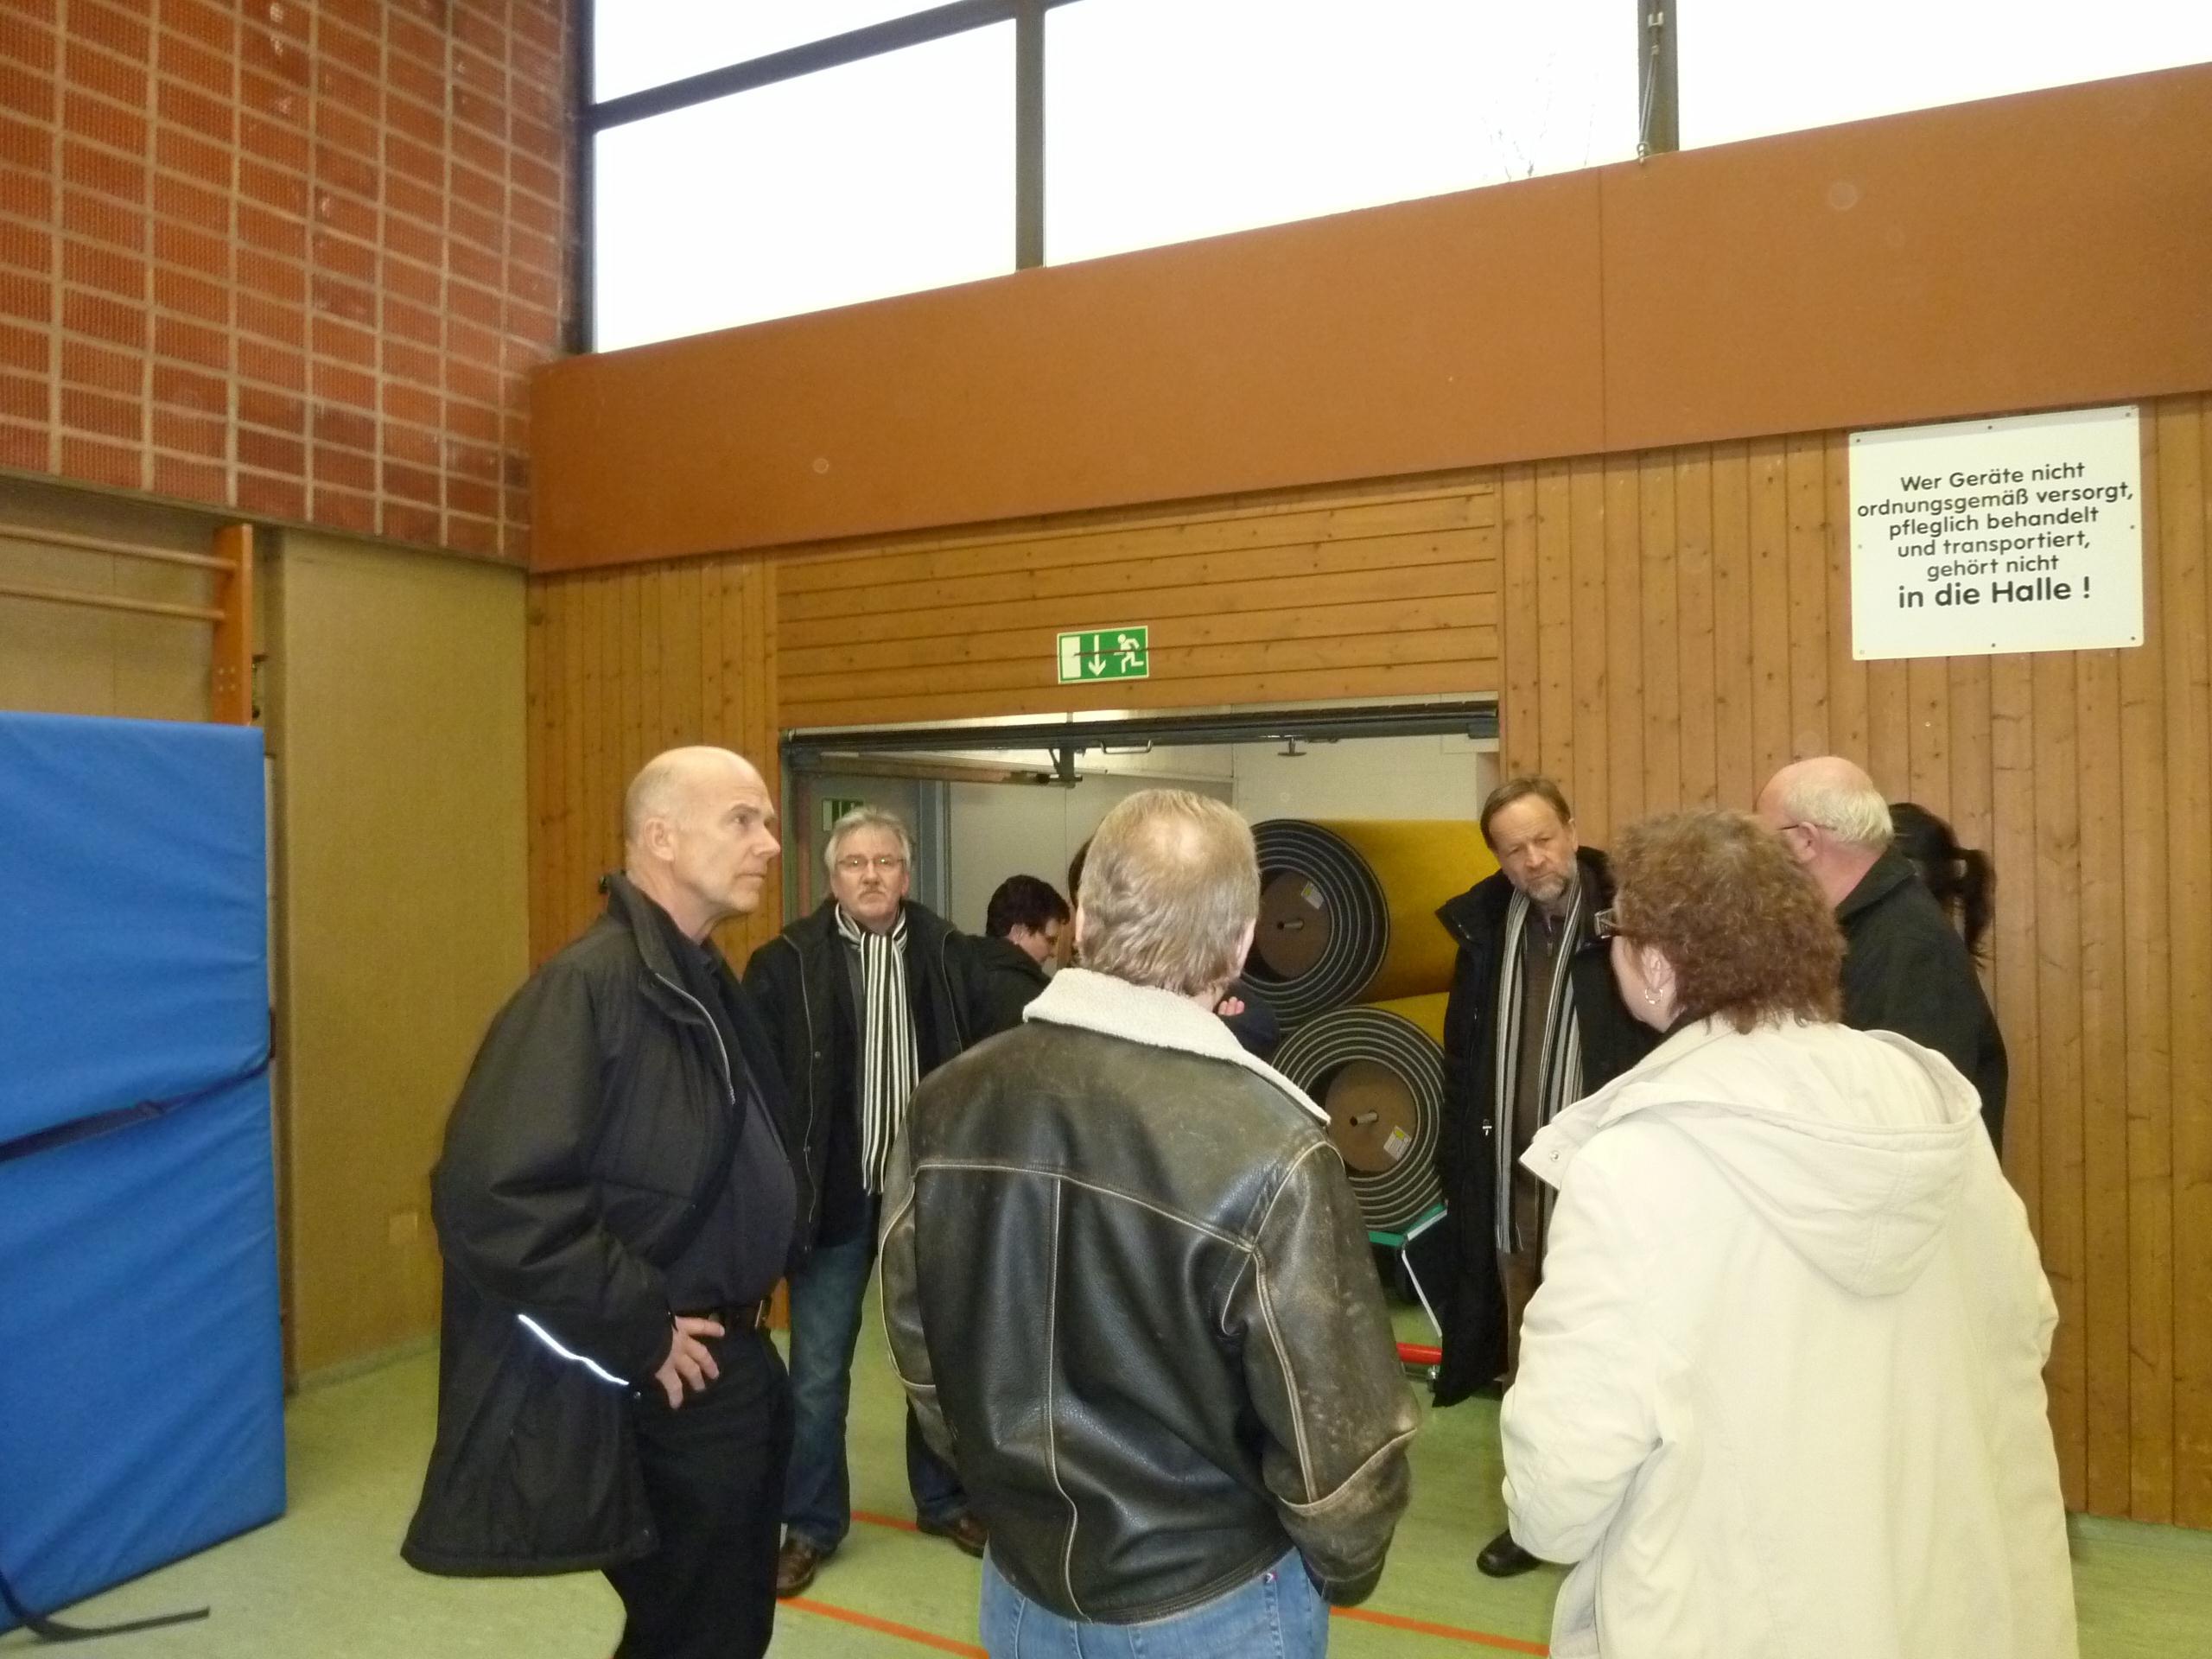 CDU-Fraktion Besichtigung Möhringer Sporthalle 02